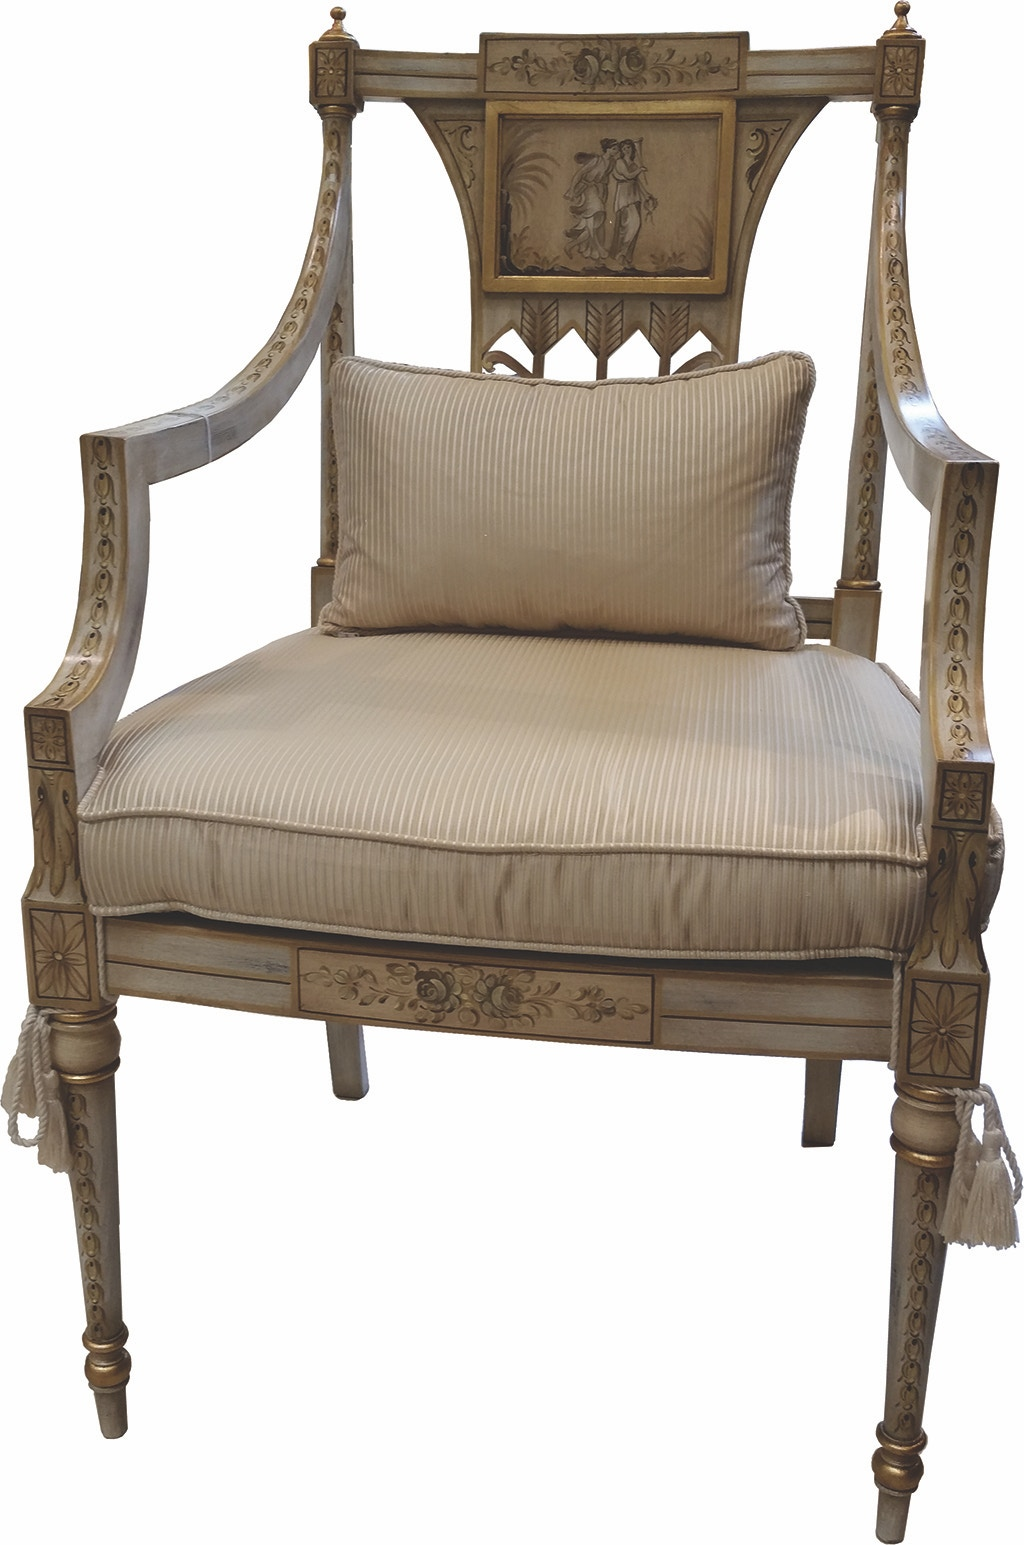 Von Hemert Interiors Italian Imports Mfr: XI29 Arm Chair #1645 P 2